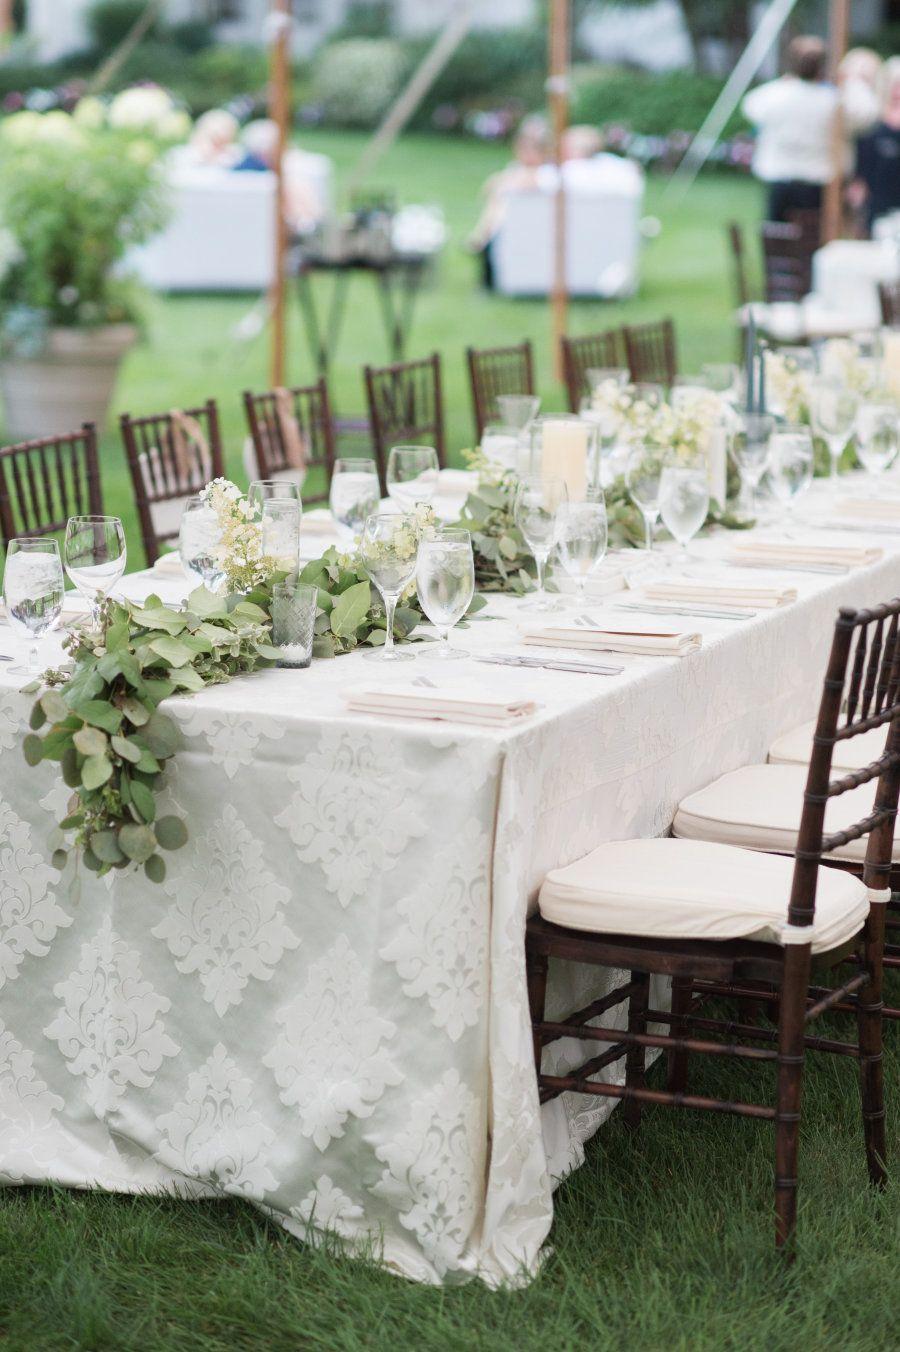 Anything But Boring Backyard Wedding In Massachusetts Wedding Backyard Reception Backyard Tent Backyard Tent Wedding